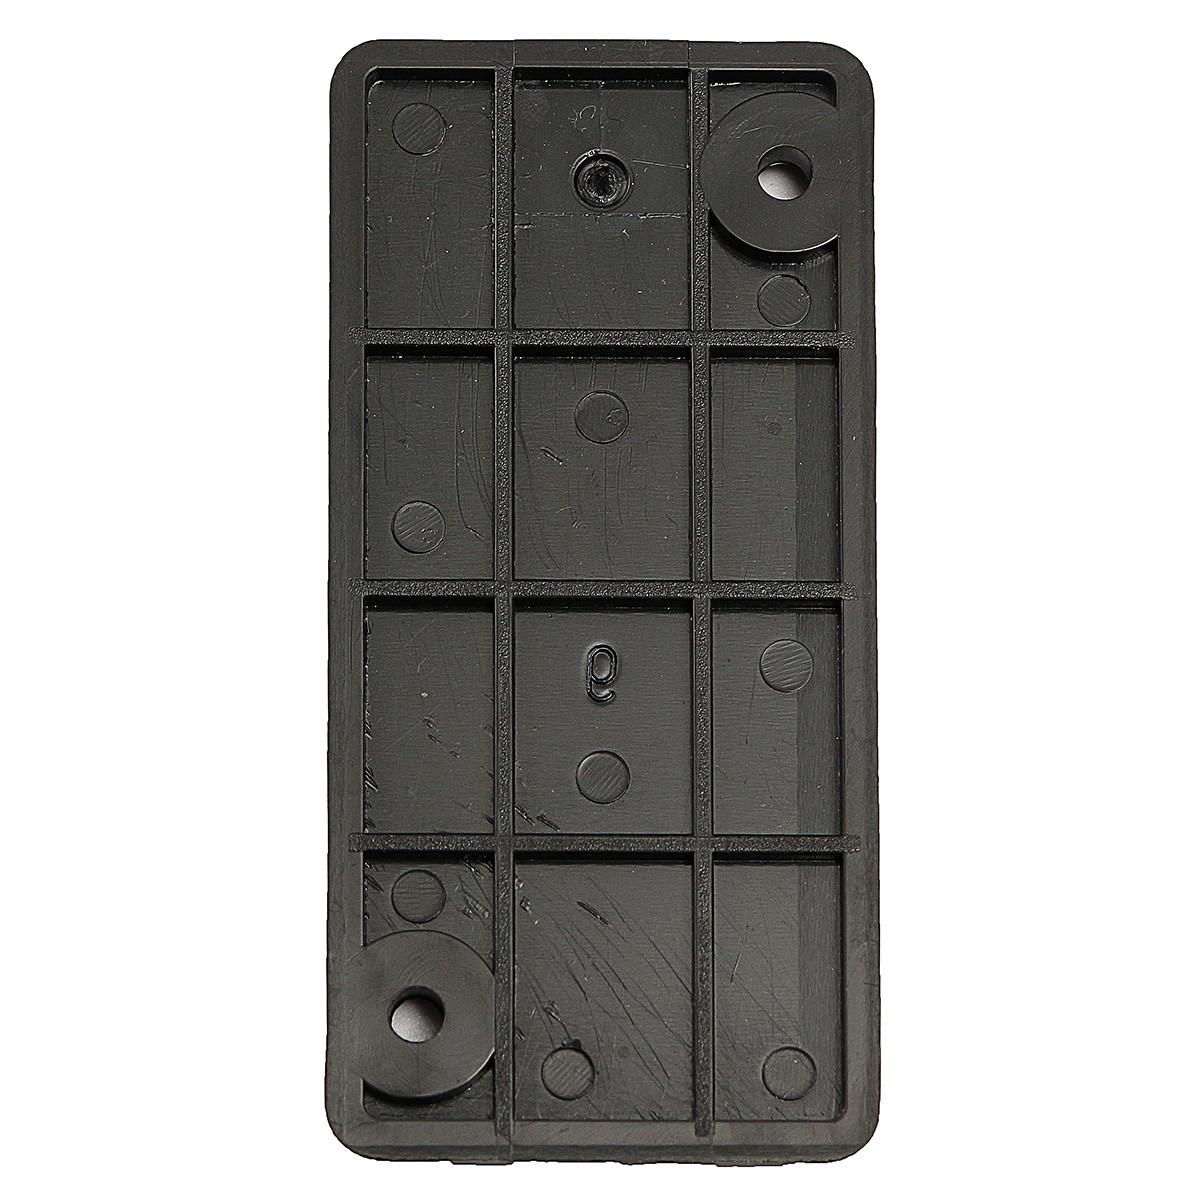 TSA Secure Luggage Combination Lock Bag Code Lock Padlock